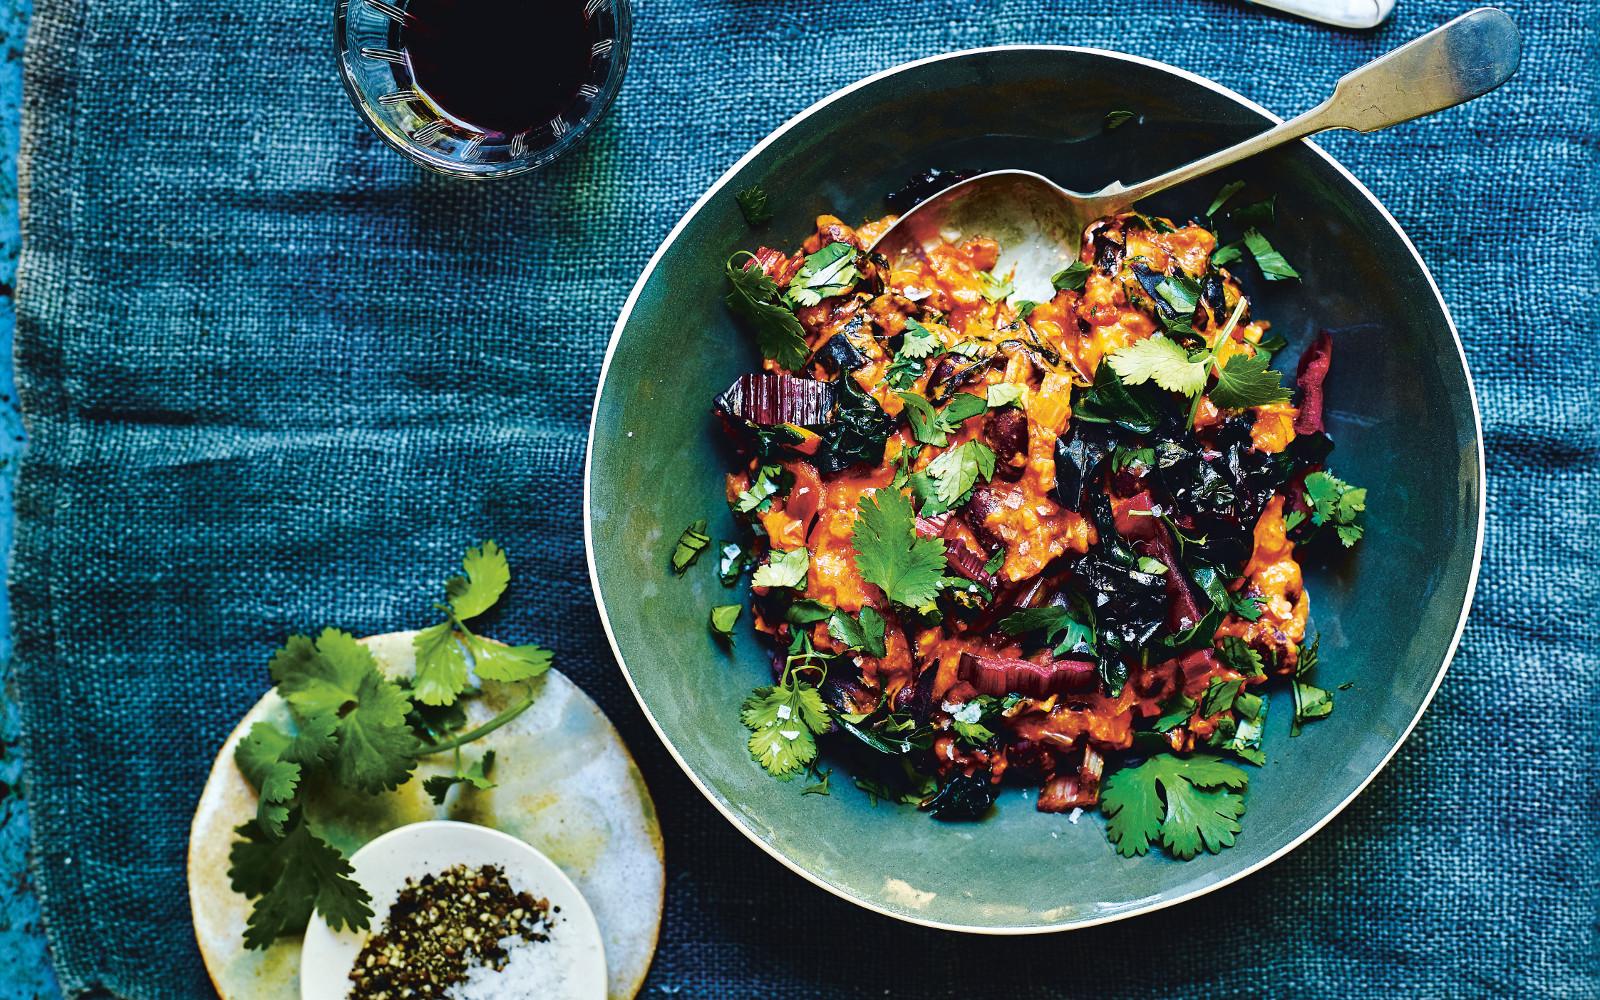 https://www.onegreenplanet.org/vegan-recipe/rainbow-chard-red-bean-and-peanut-stew/